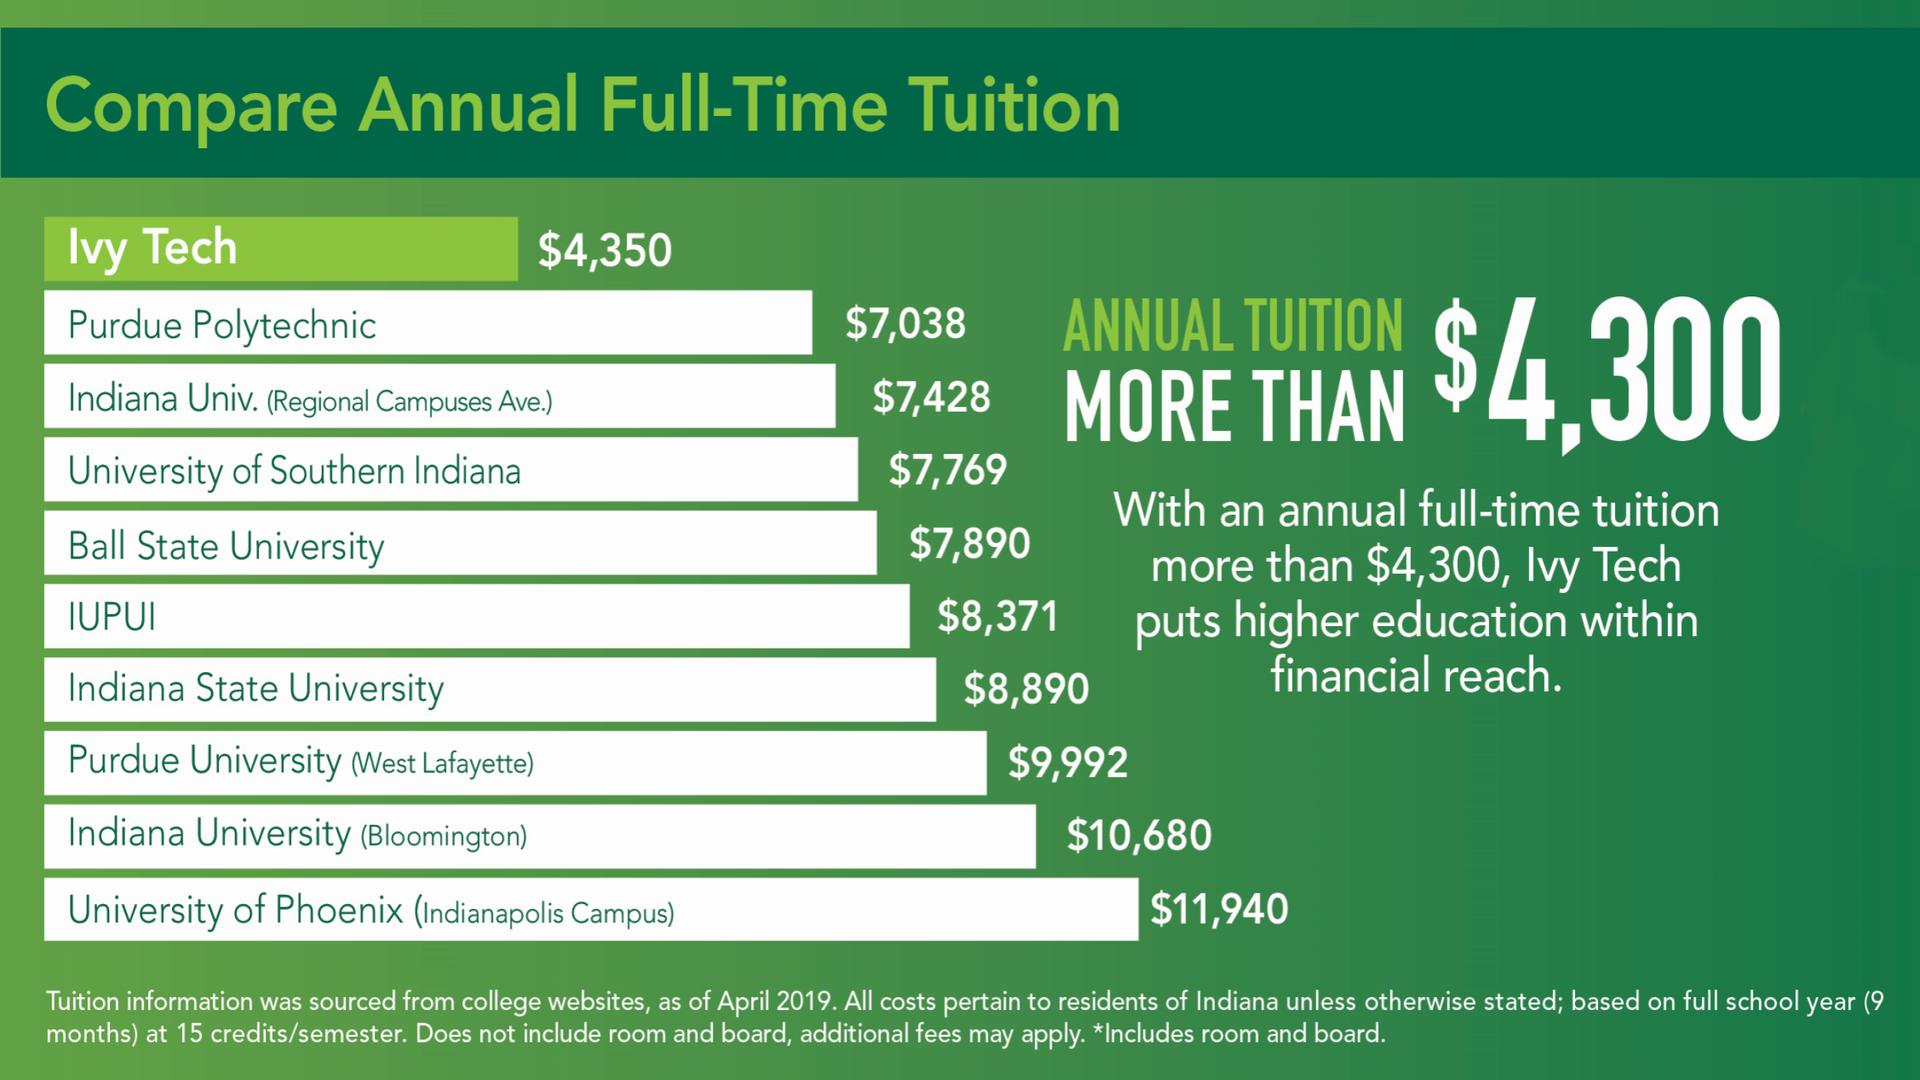 Annual Tuition